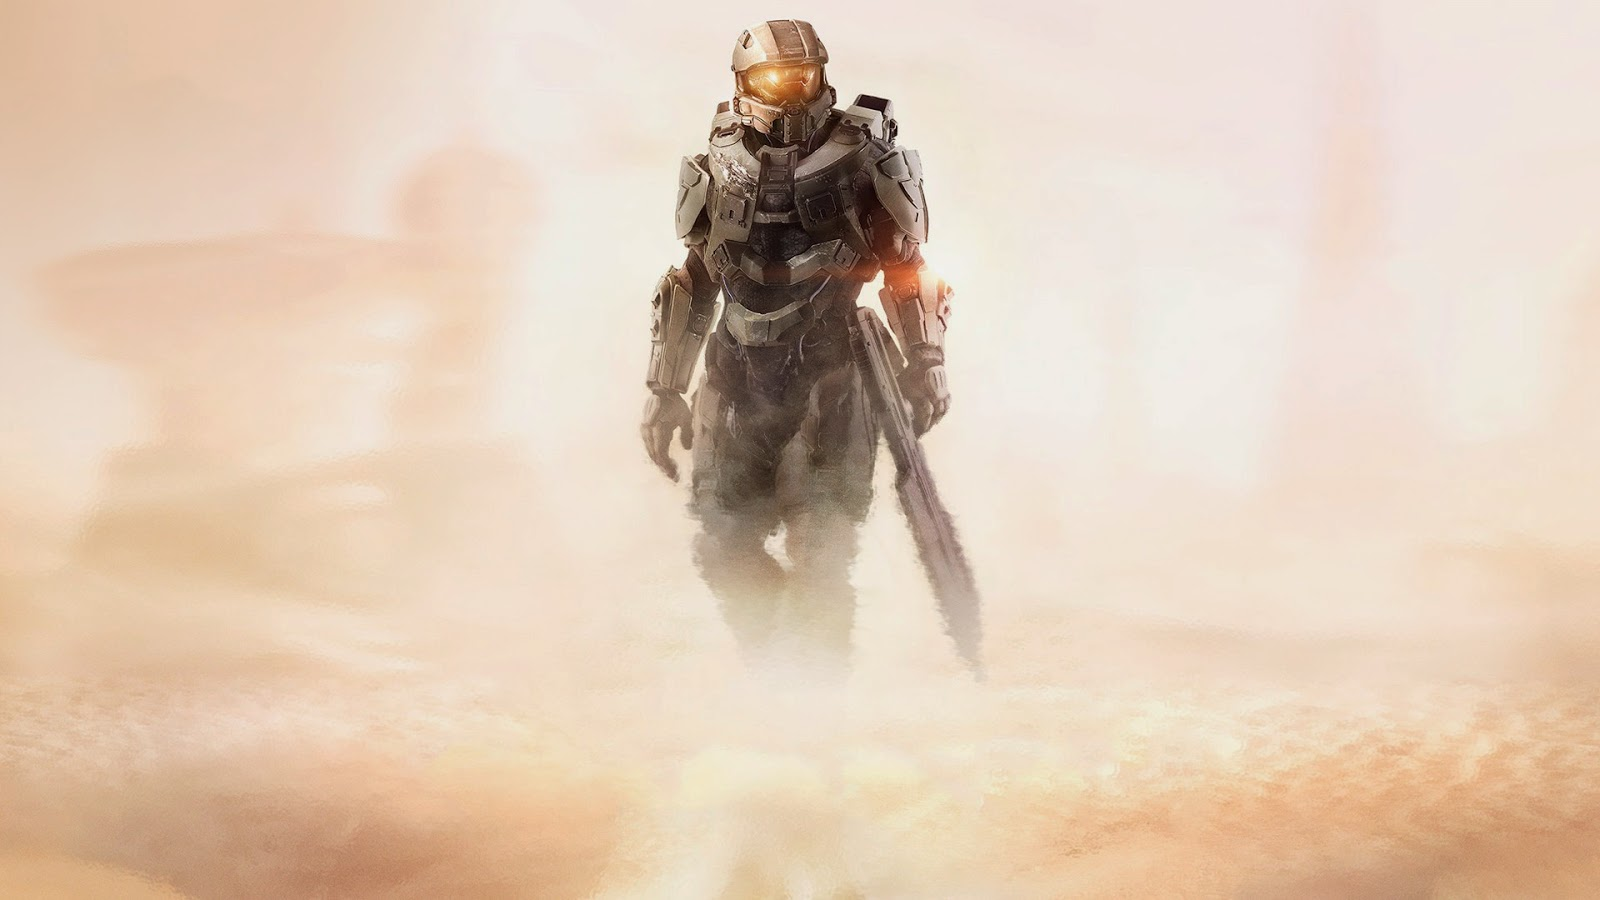 Halo 5 wallpaper 1080p 1600x900